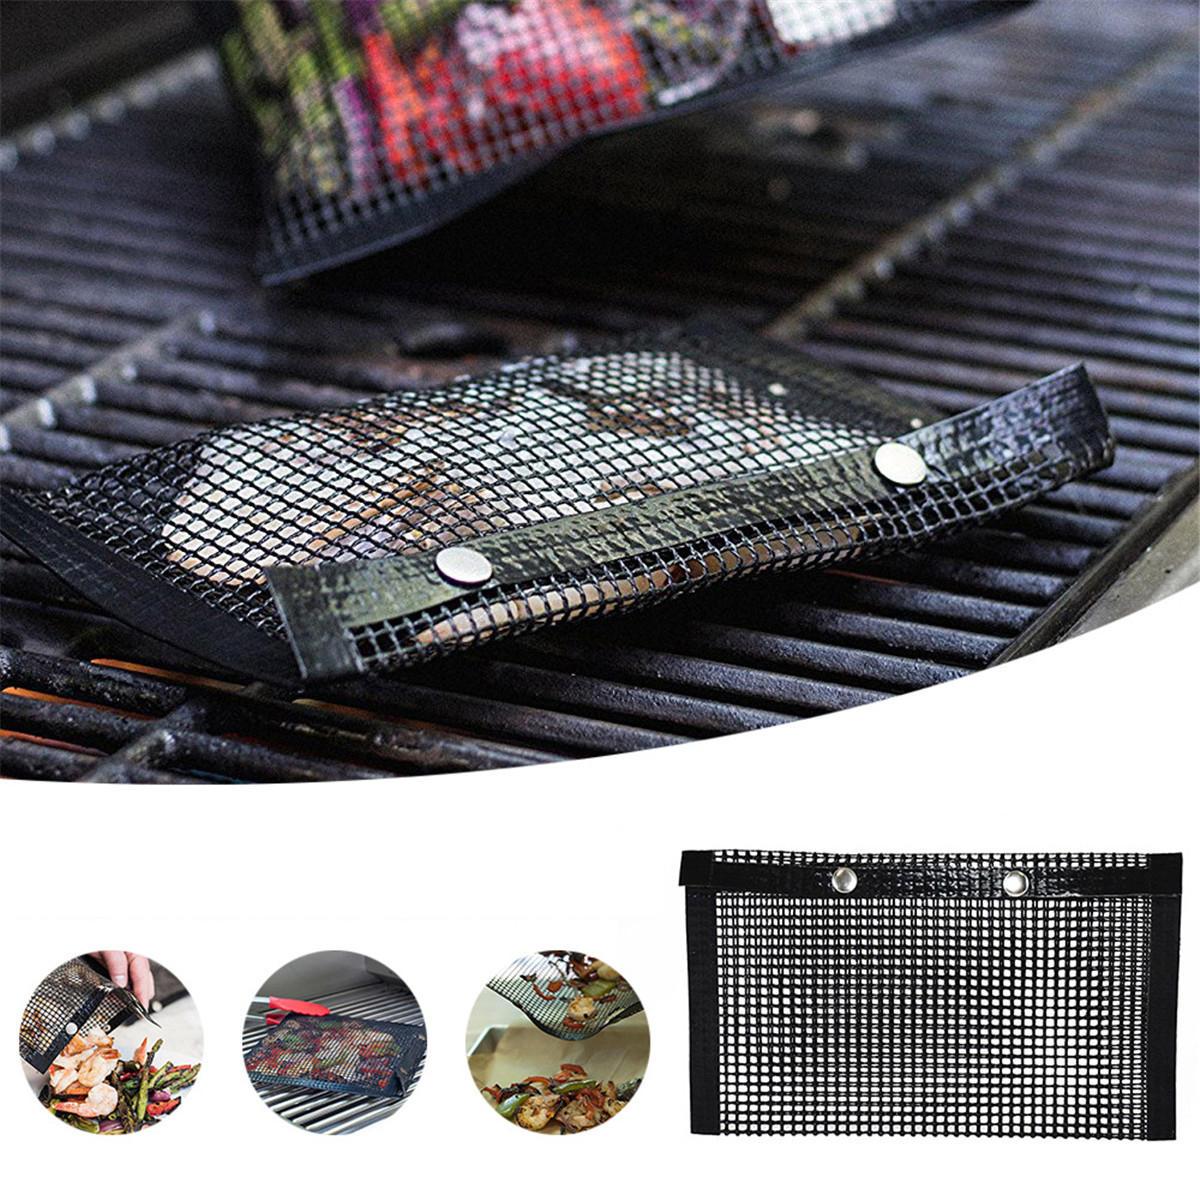 5Pcs Grill Mats BBQ Bake Chef Non Stick Pad Mat Camping Hiking Home Outdoor Tool